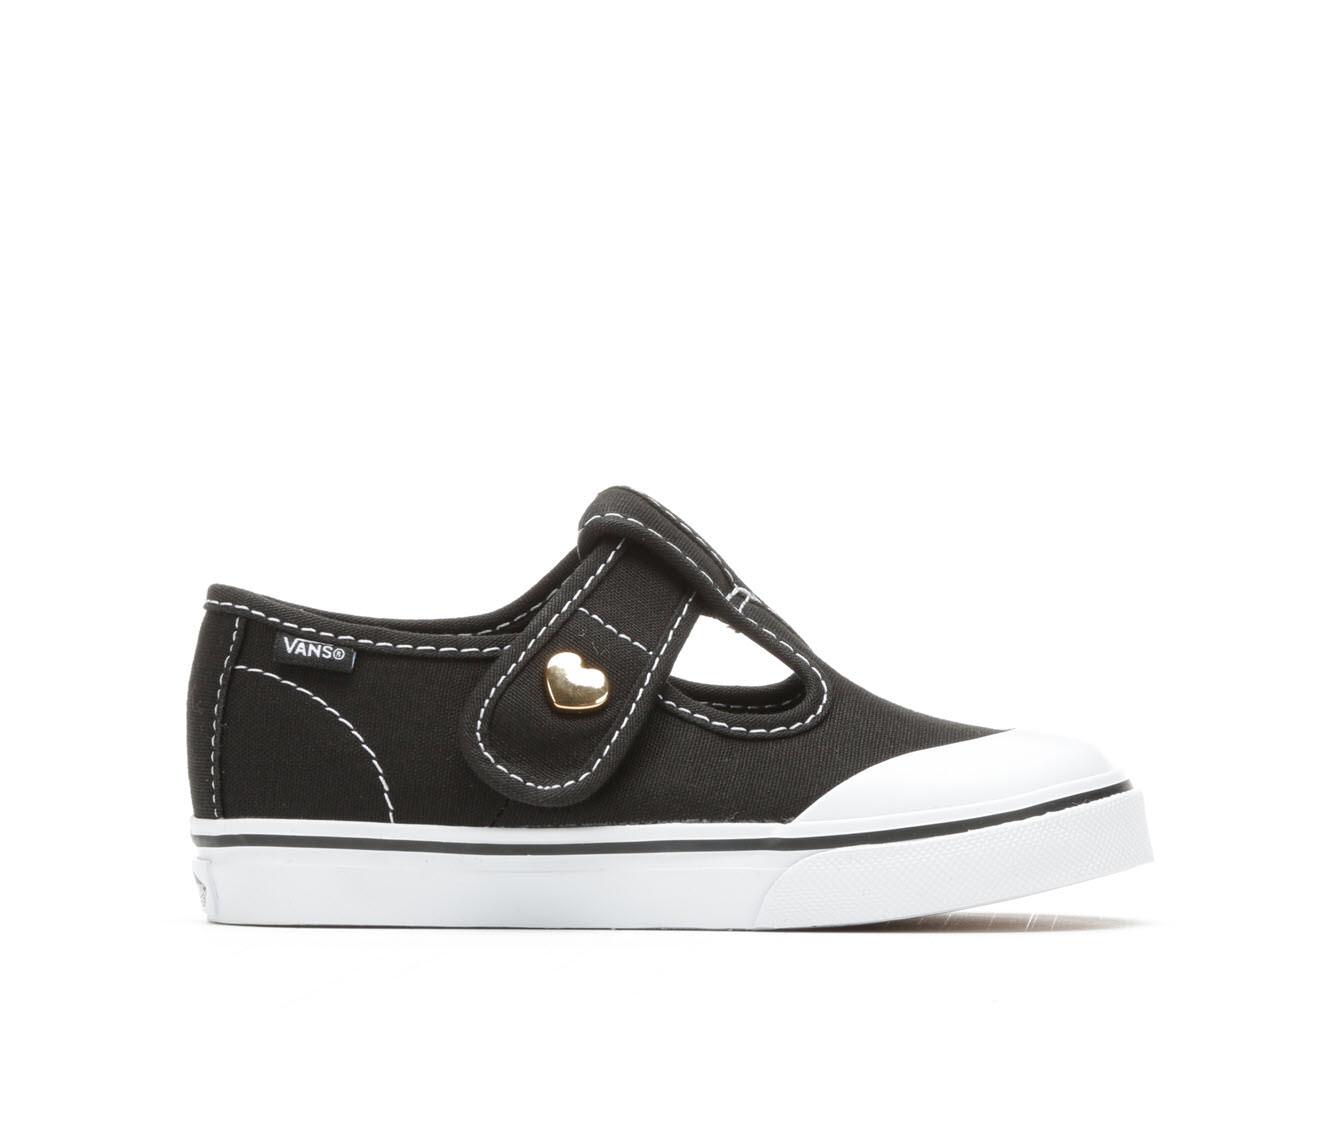 Girls' Vans Infant Leena Velcro Sneakers (Black)